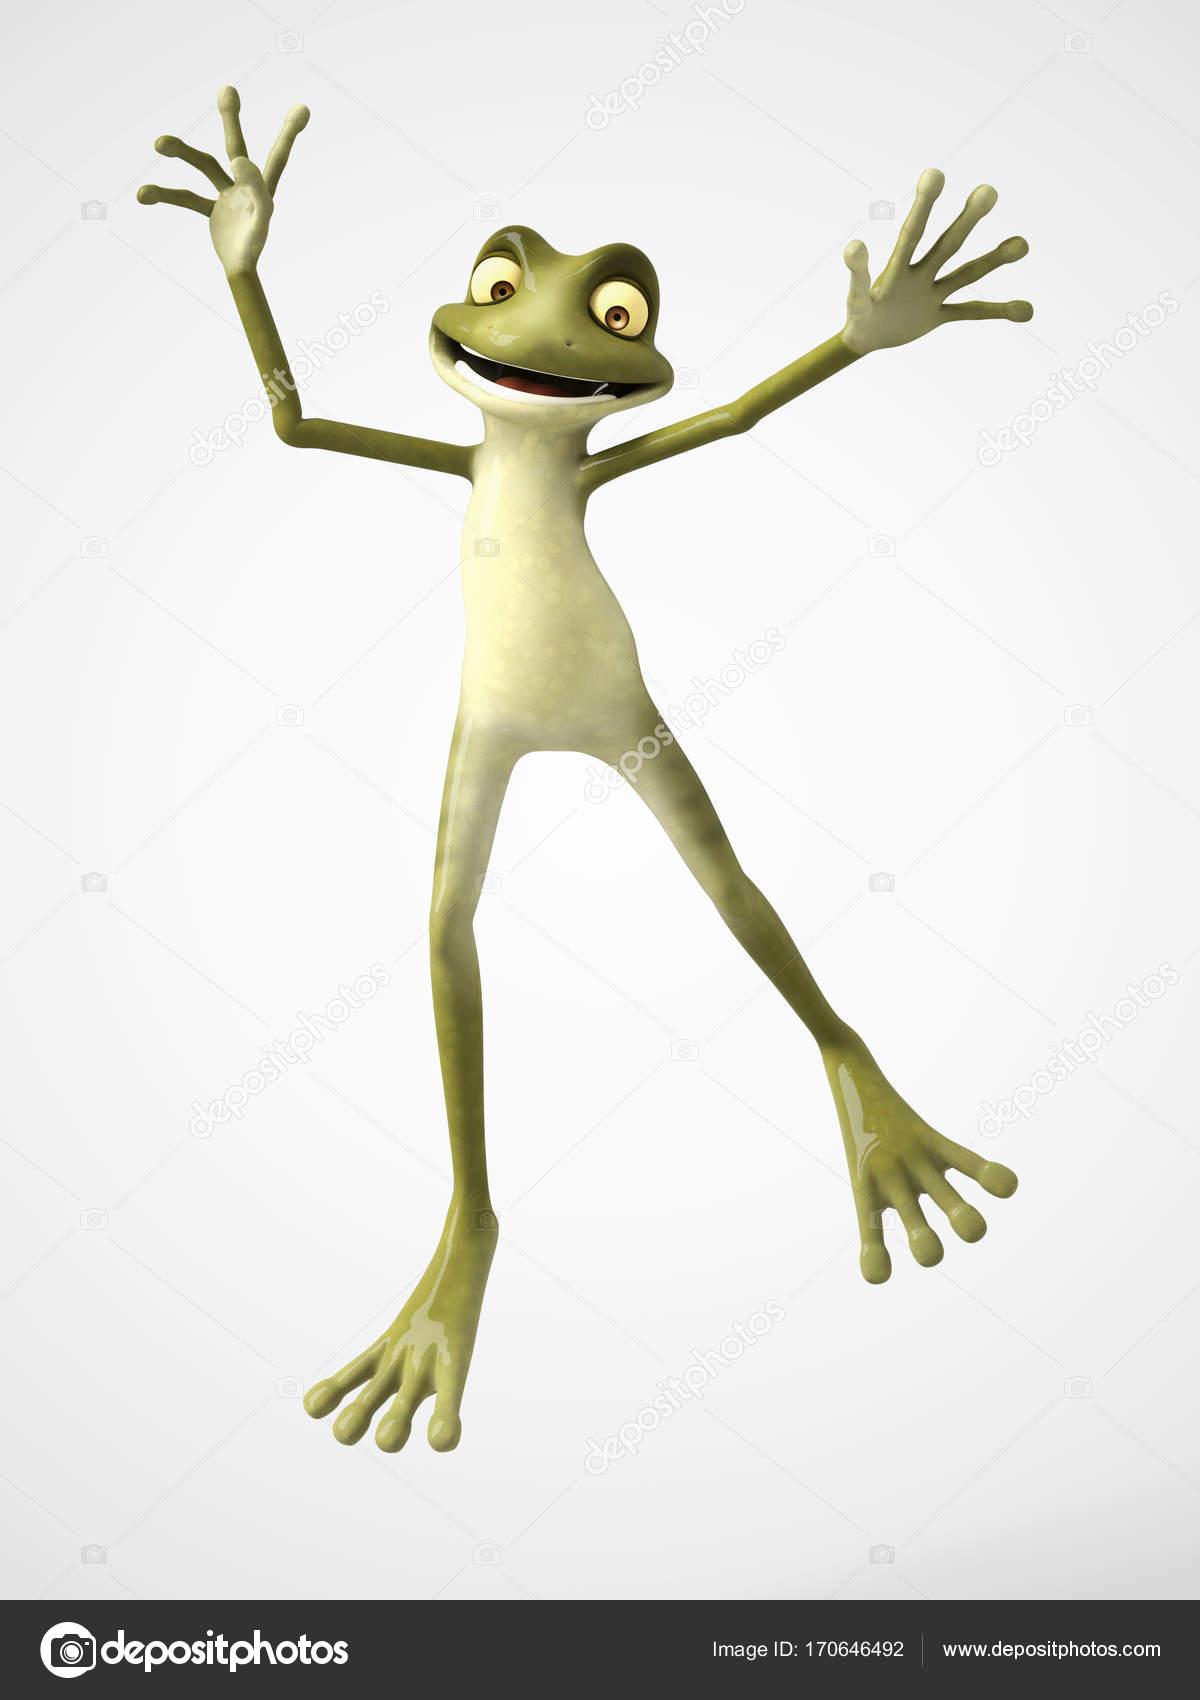 3d Rendering Cartoon Frosch Springen Vor Freude Stockfoto Sarah5